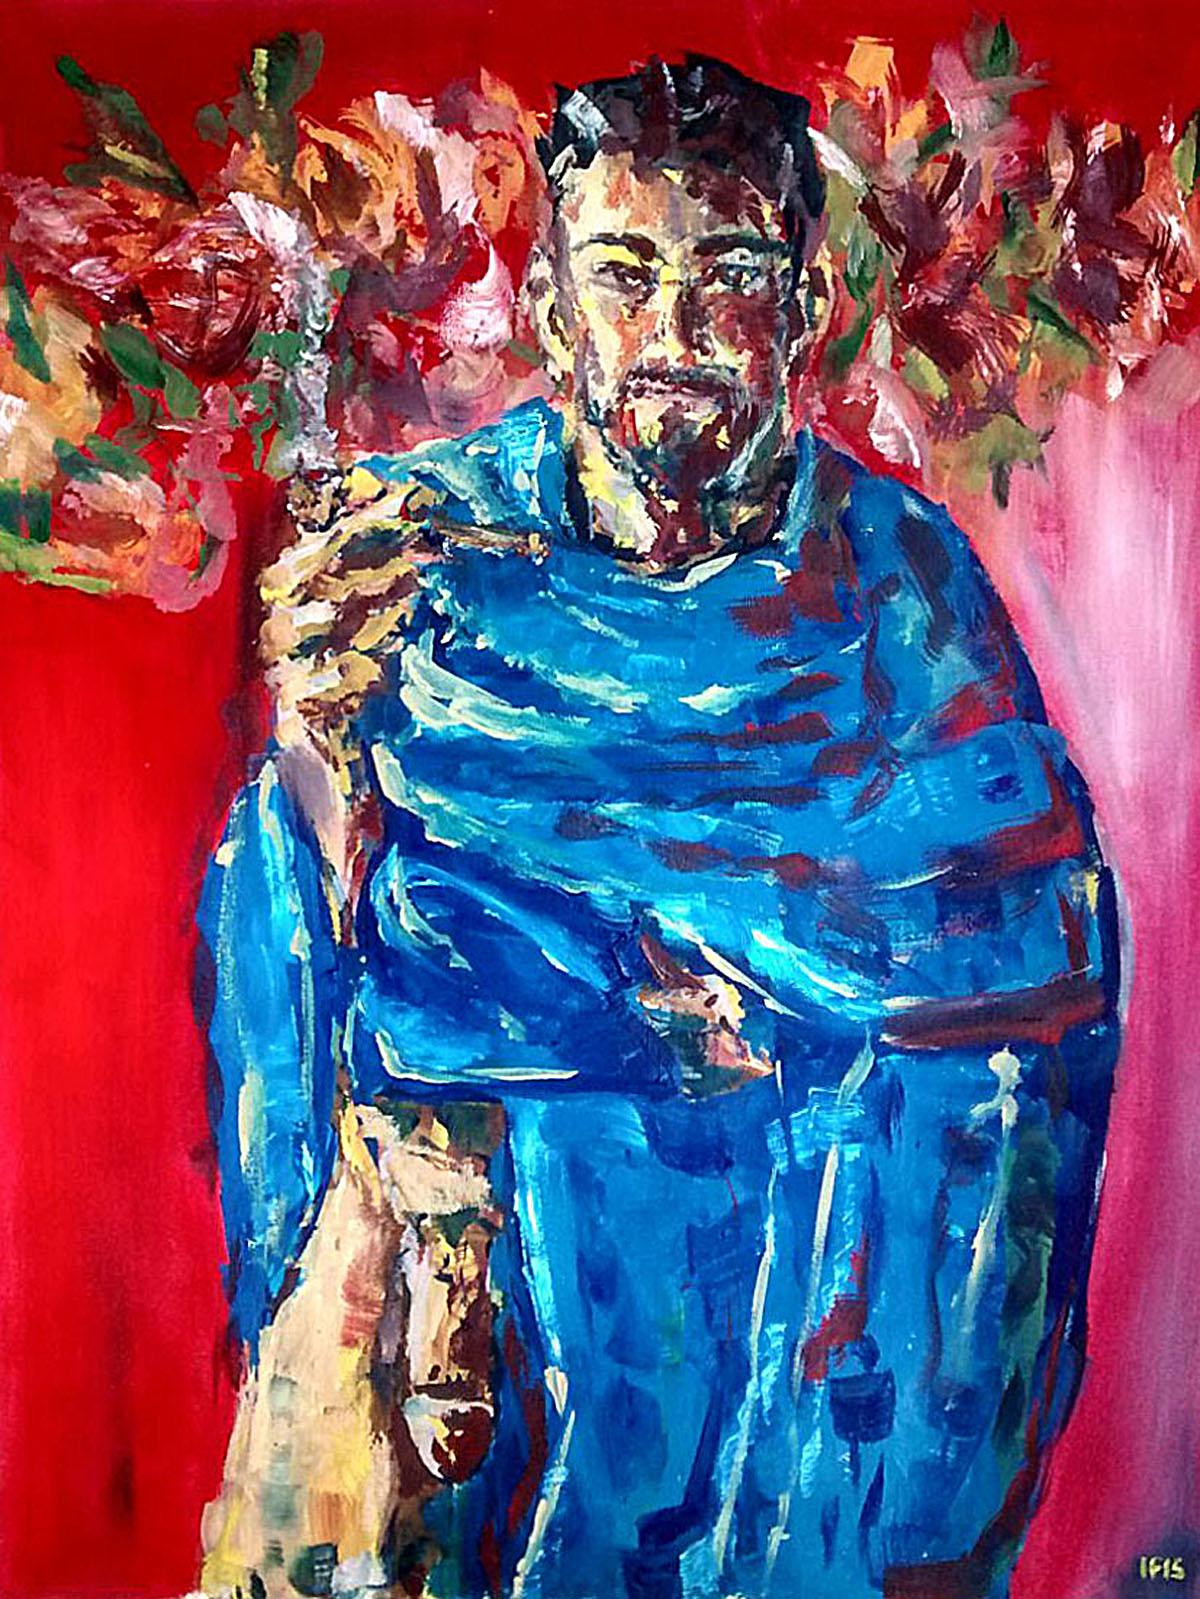 Jewish gay smoking weed (2015) oil on canvas, 60x45